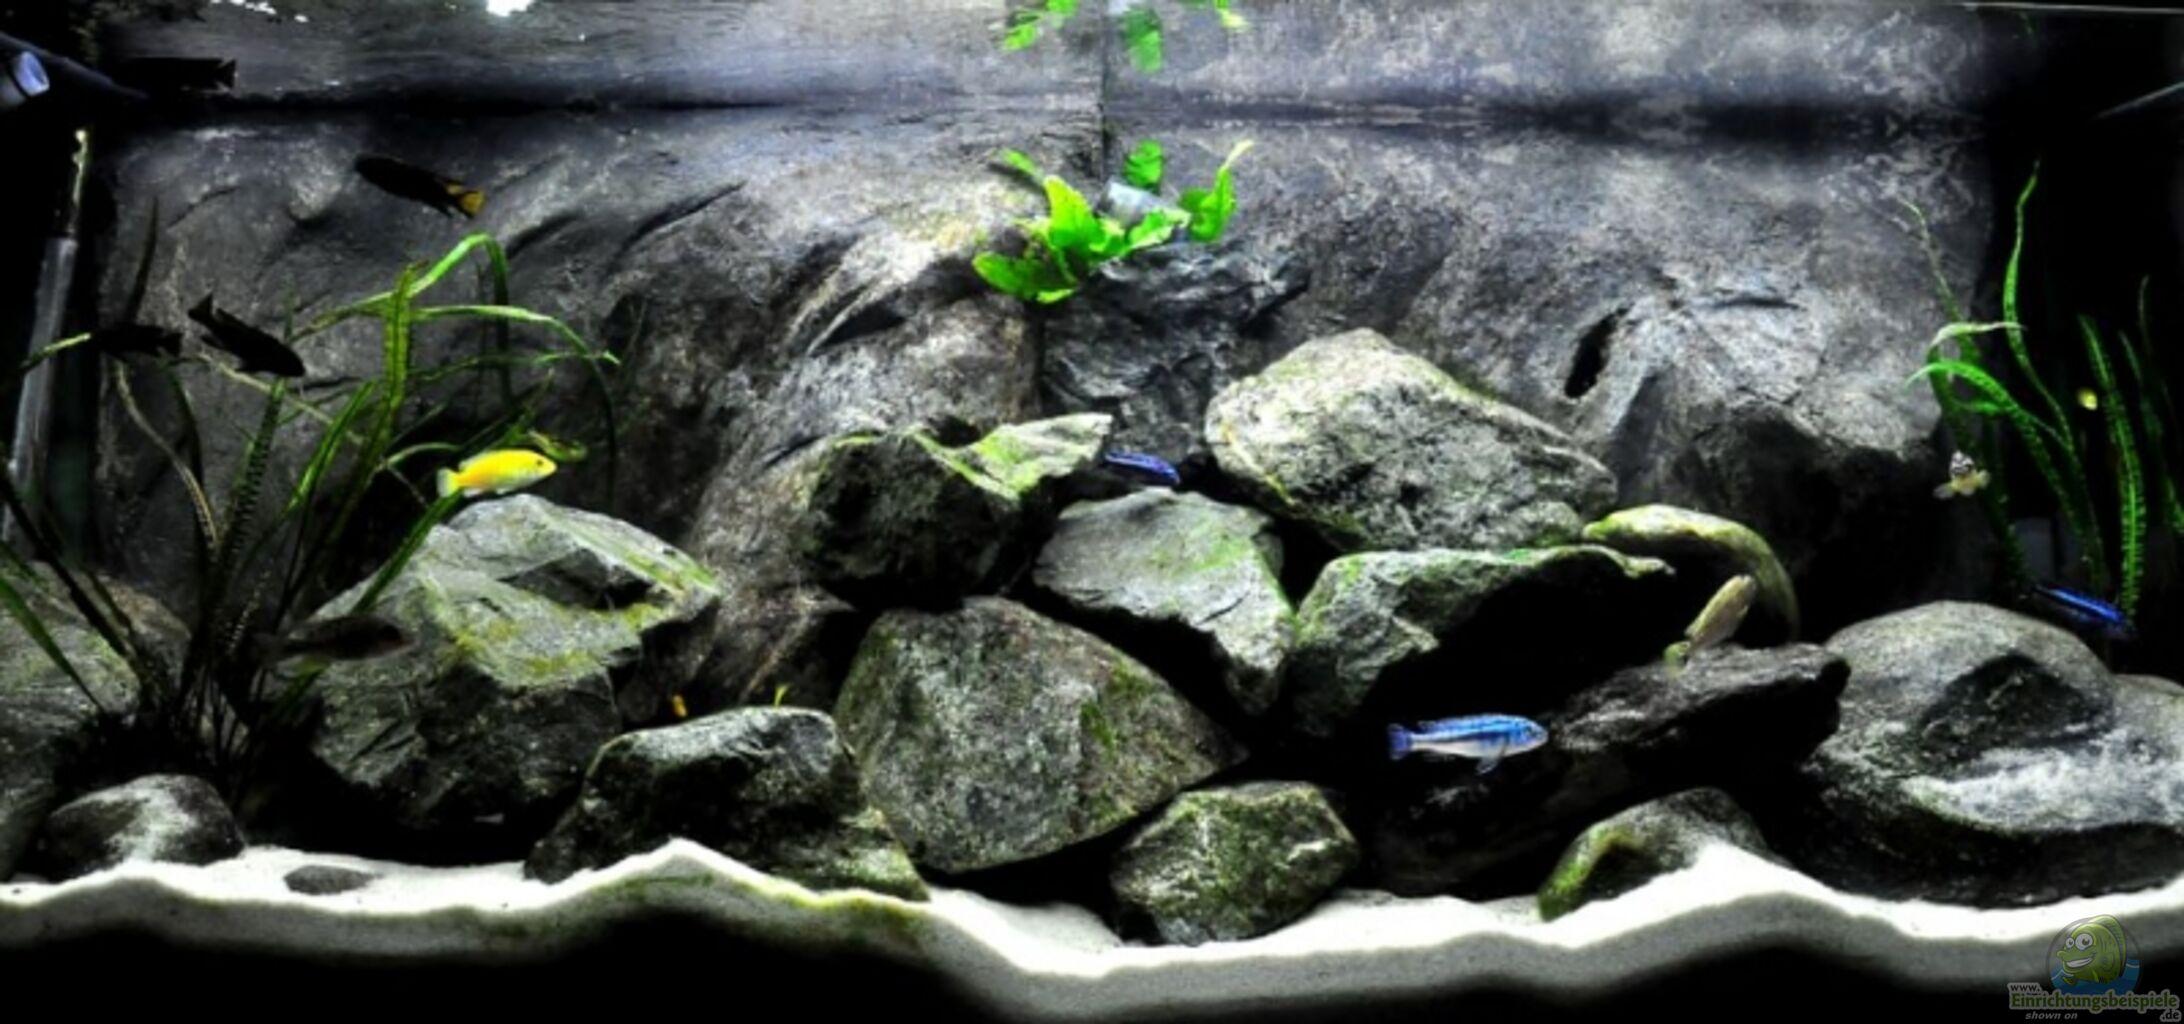 aquarium von pete becken 8409. Black Bedroom Furniture Sets. Home Design Ideas